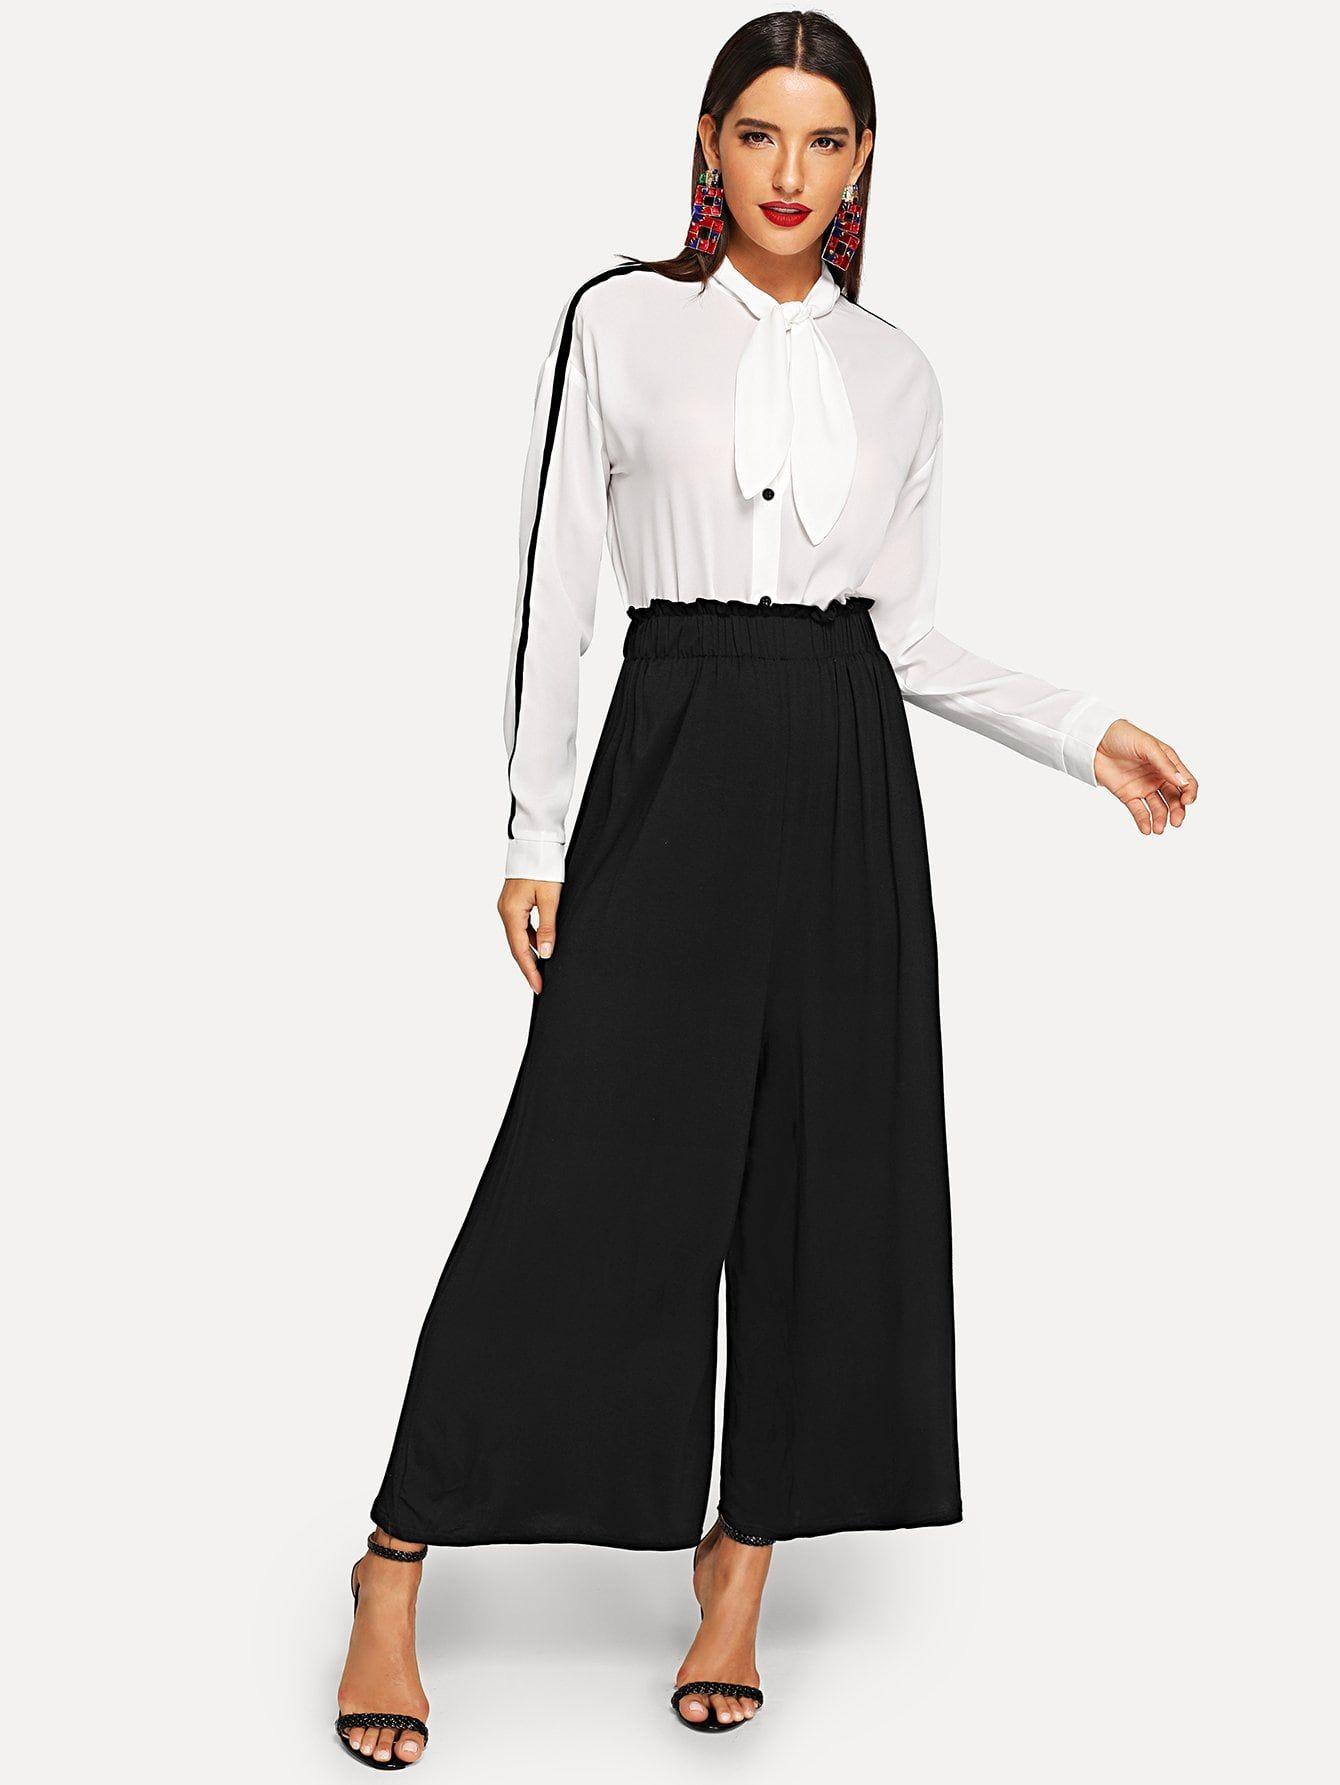 140767dcd8 Casual Ruffle Plain Wide Leg Loose Elastic Waist Mid Waist Black Crop  Length Wide Leg Pants